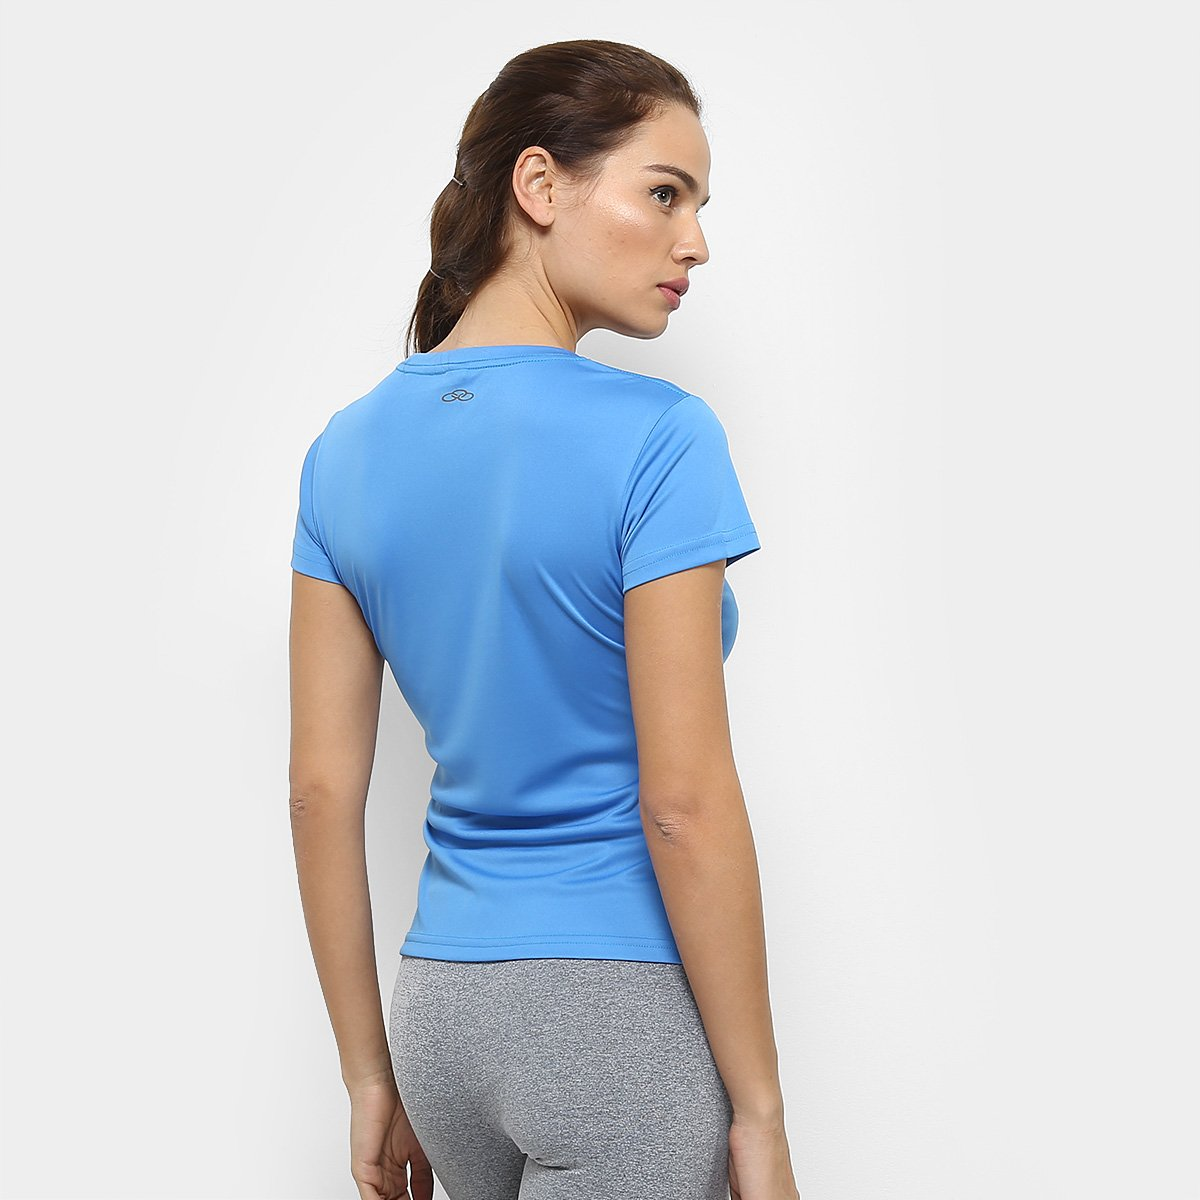 Feminina Olympikus Camiseta Olympikus Camiseta Essential Azul Olympikus Claro Azul Feminina Dry Claro Essential Action Camiseta Action Dry 1q18px